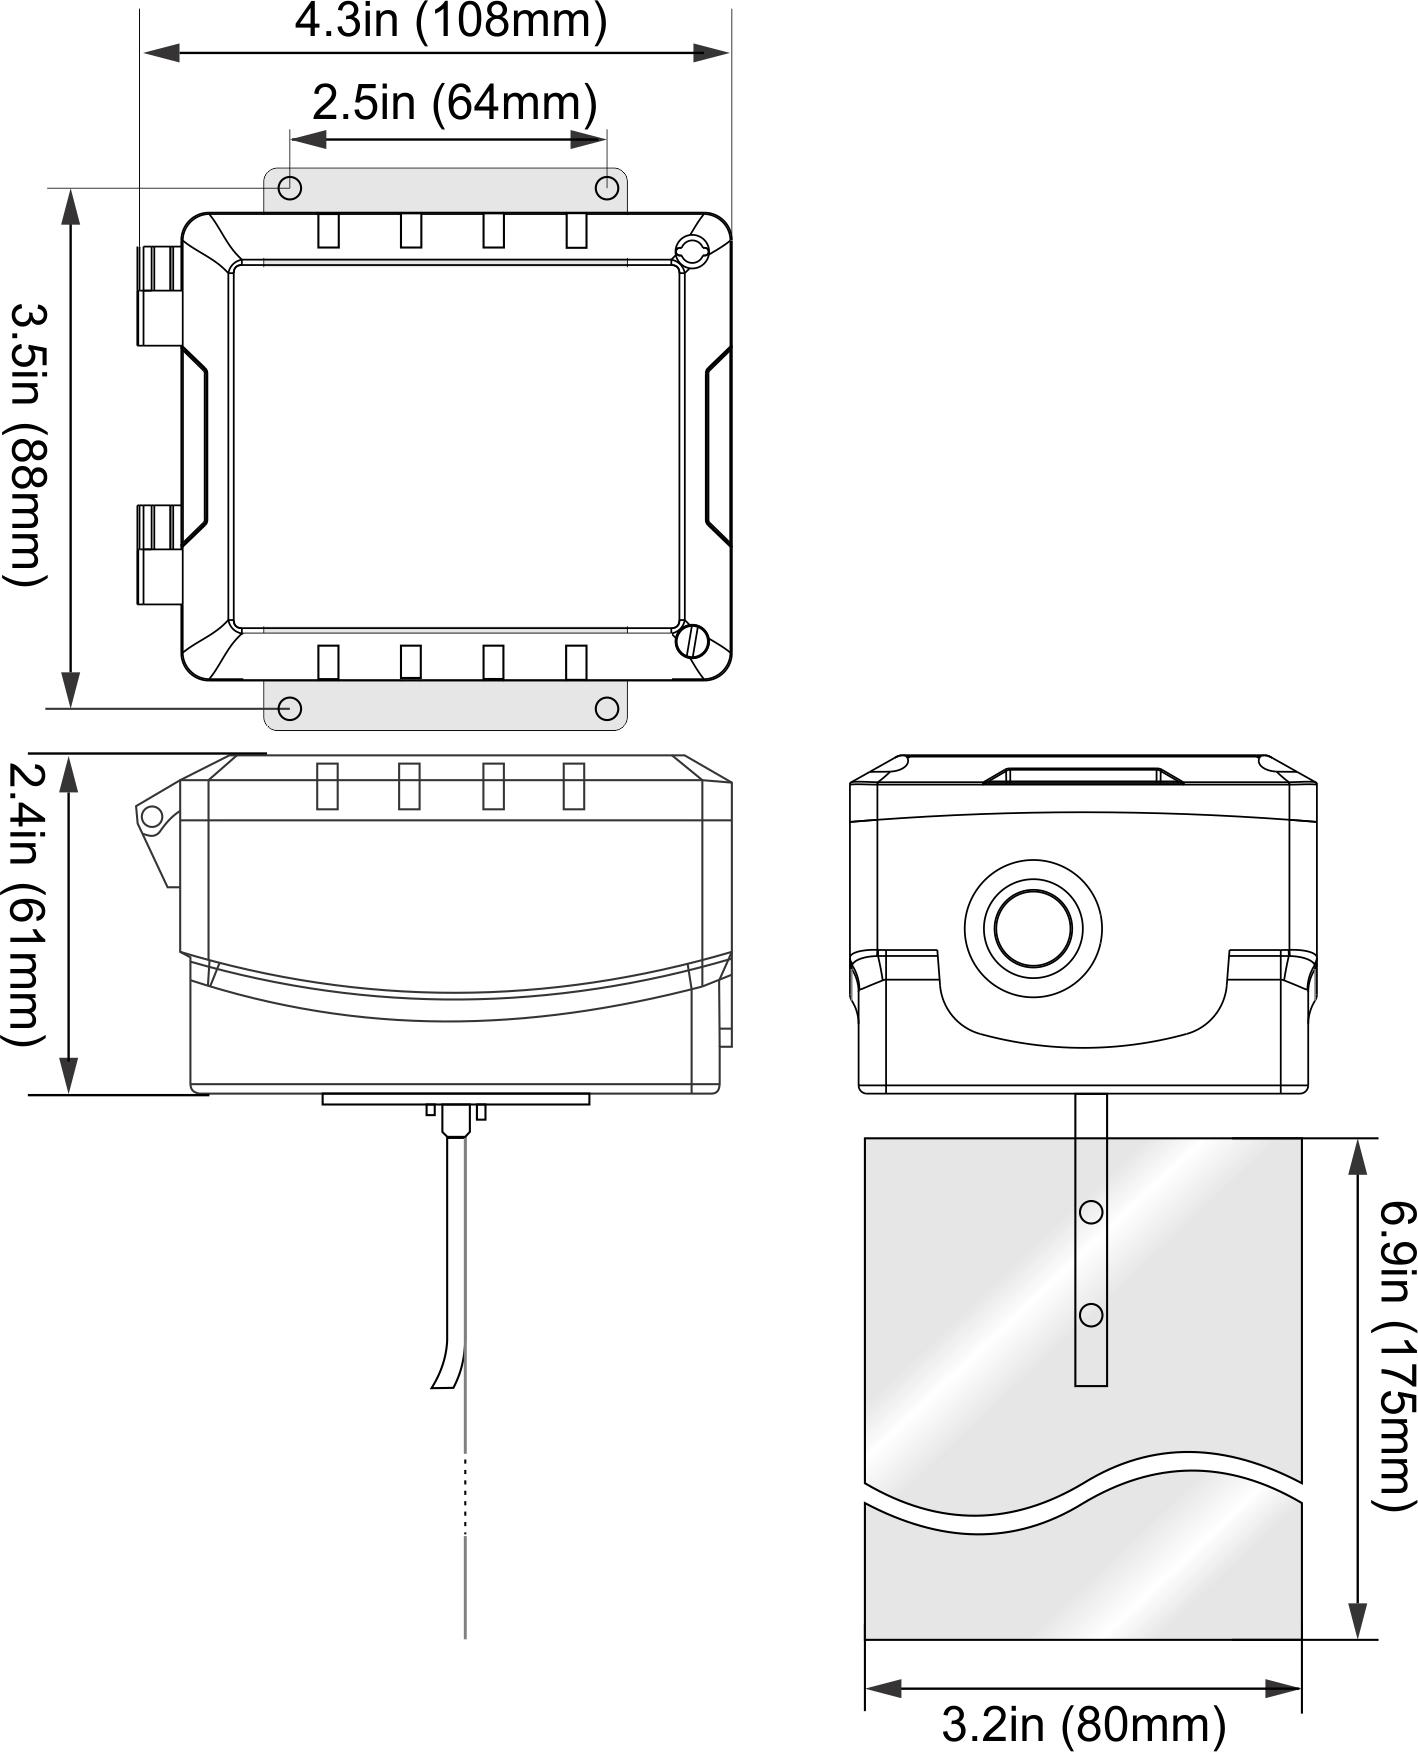 Vw T4 Indicator Wiring Diagram : Vw t cer wiring diagram jeffdoedesign